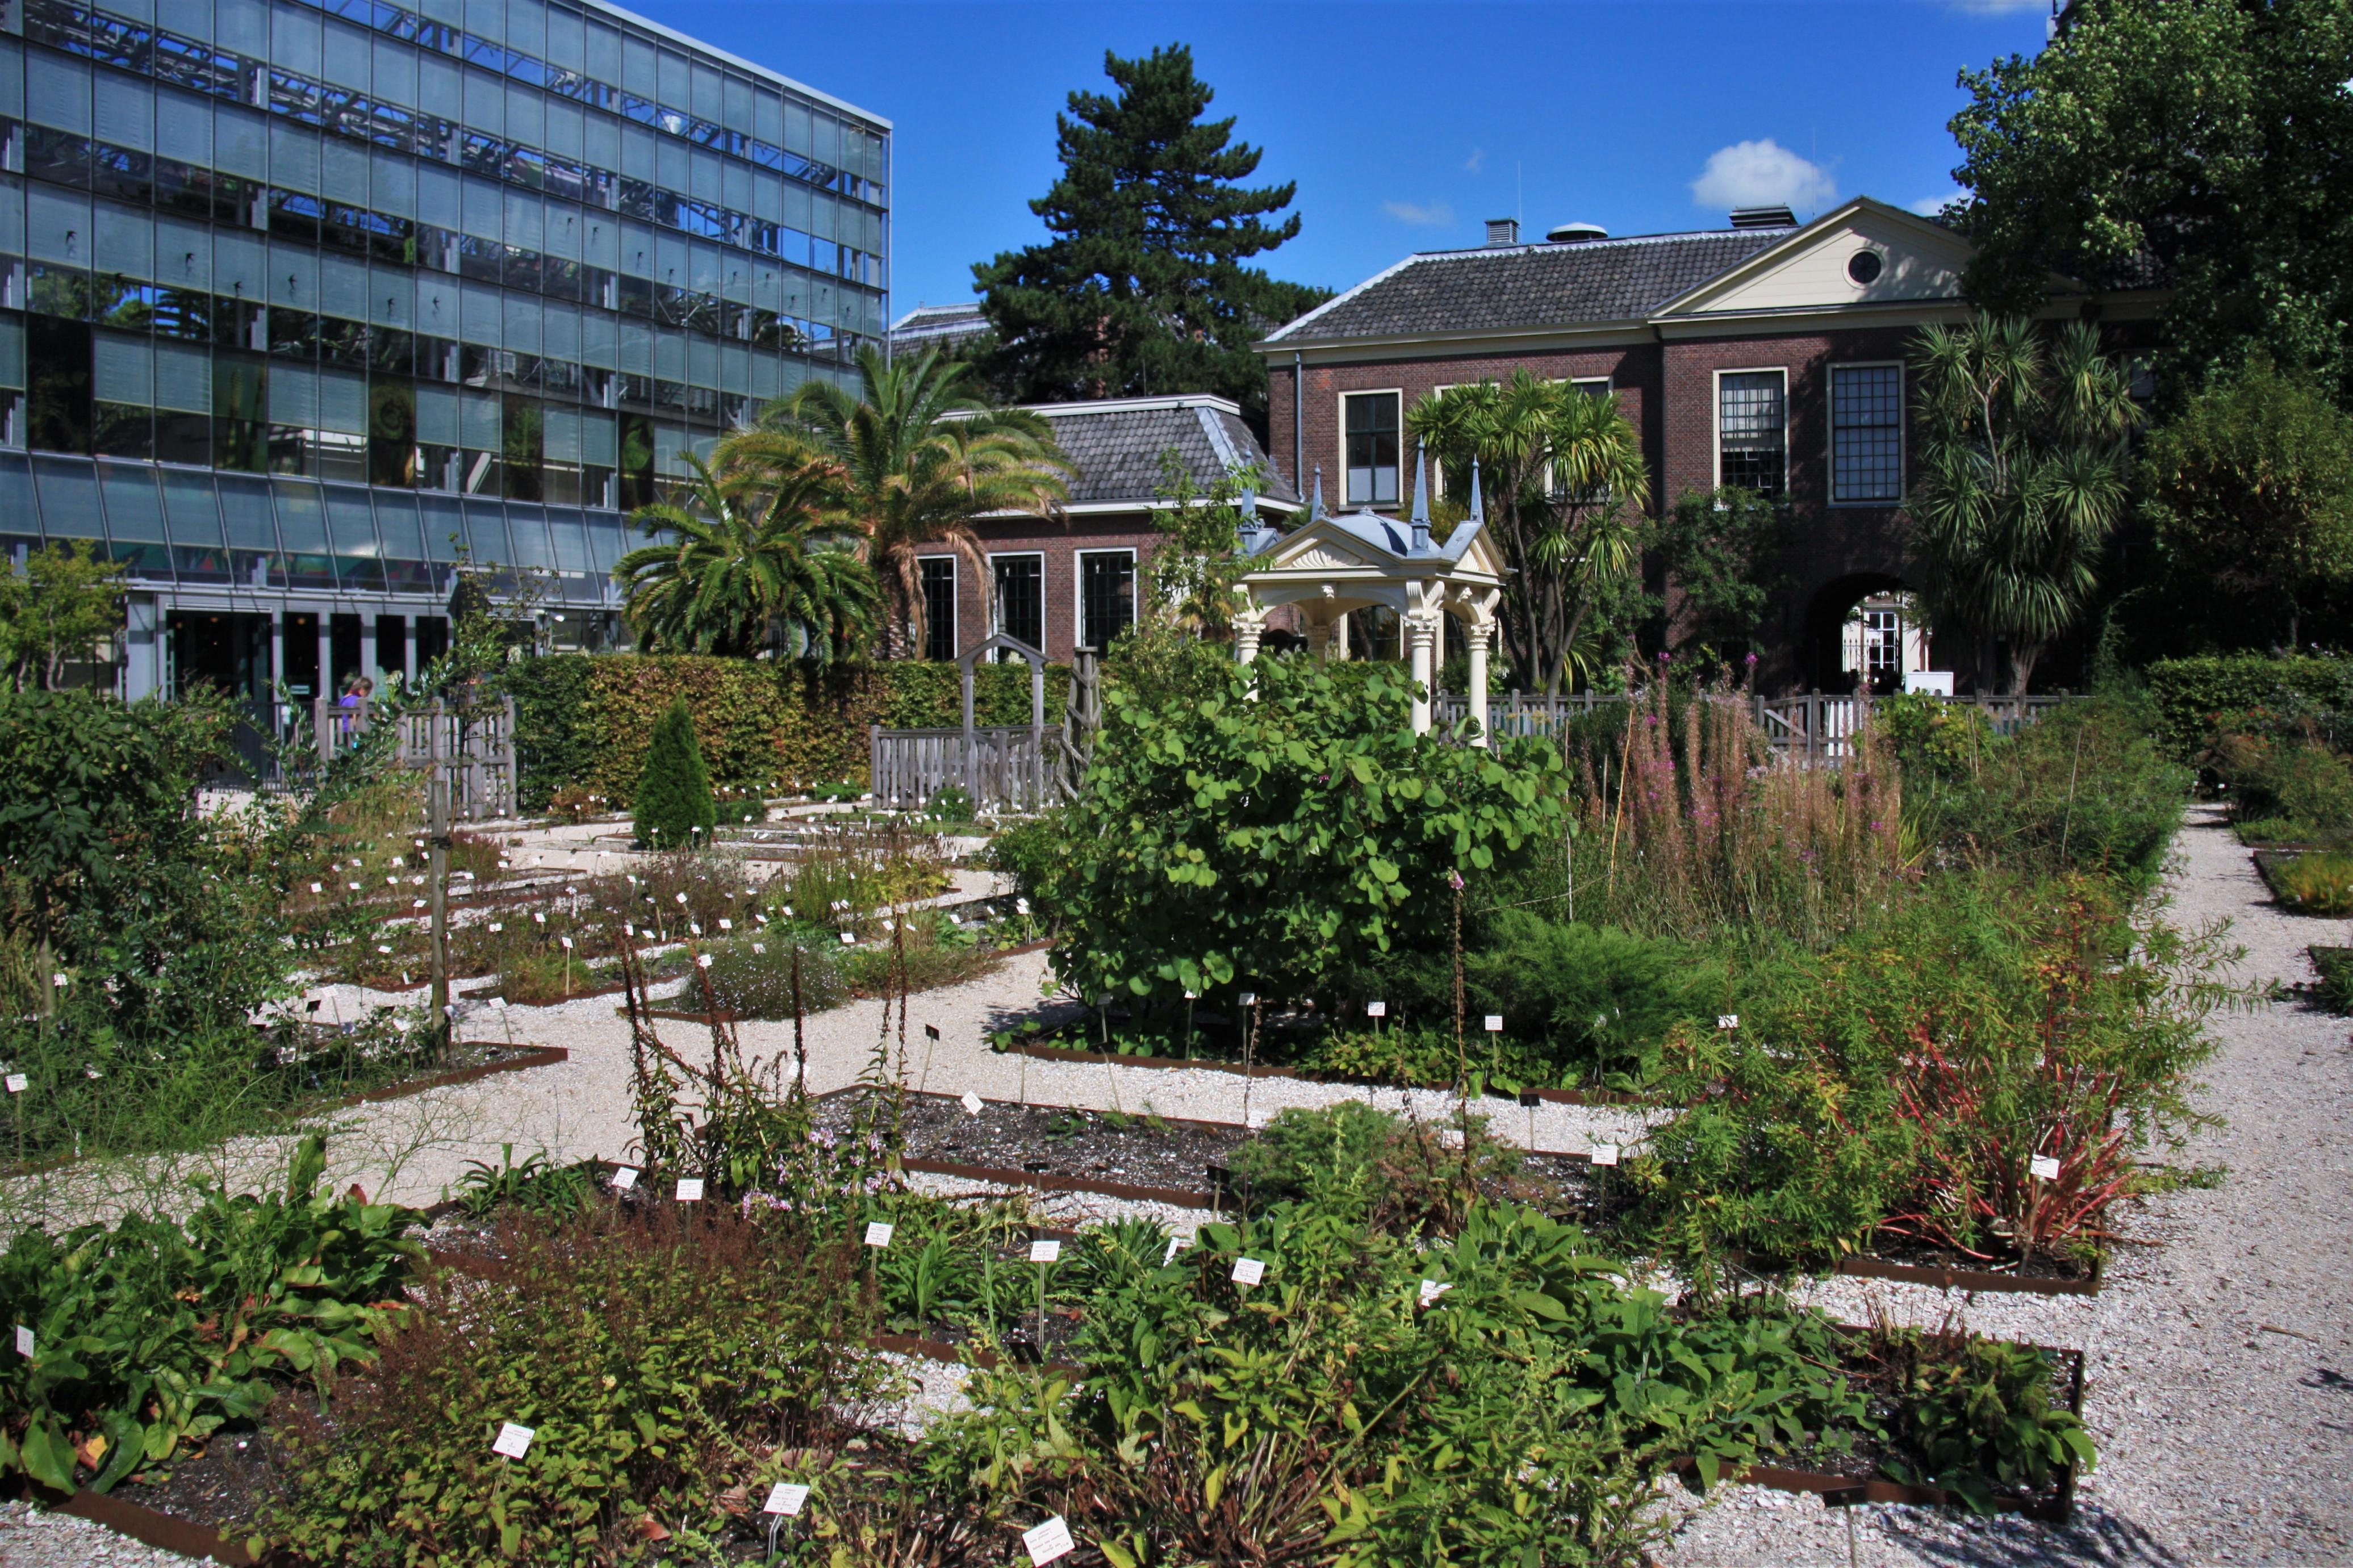 Botanische Tuin Leiden : File hortus botanicus leiden clusius garden g wikimedia commons